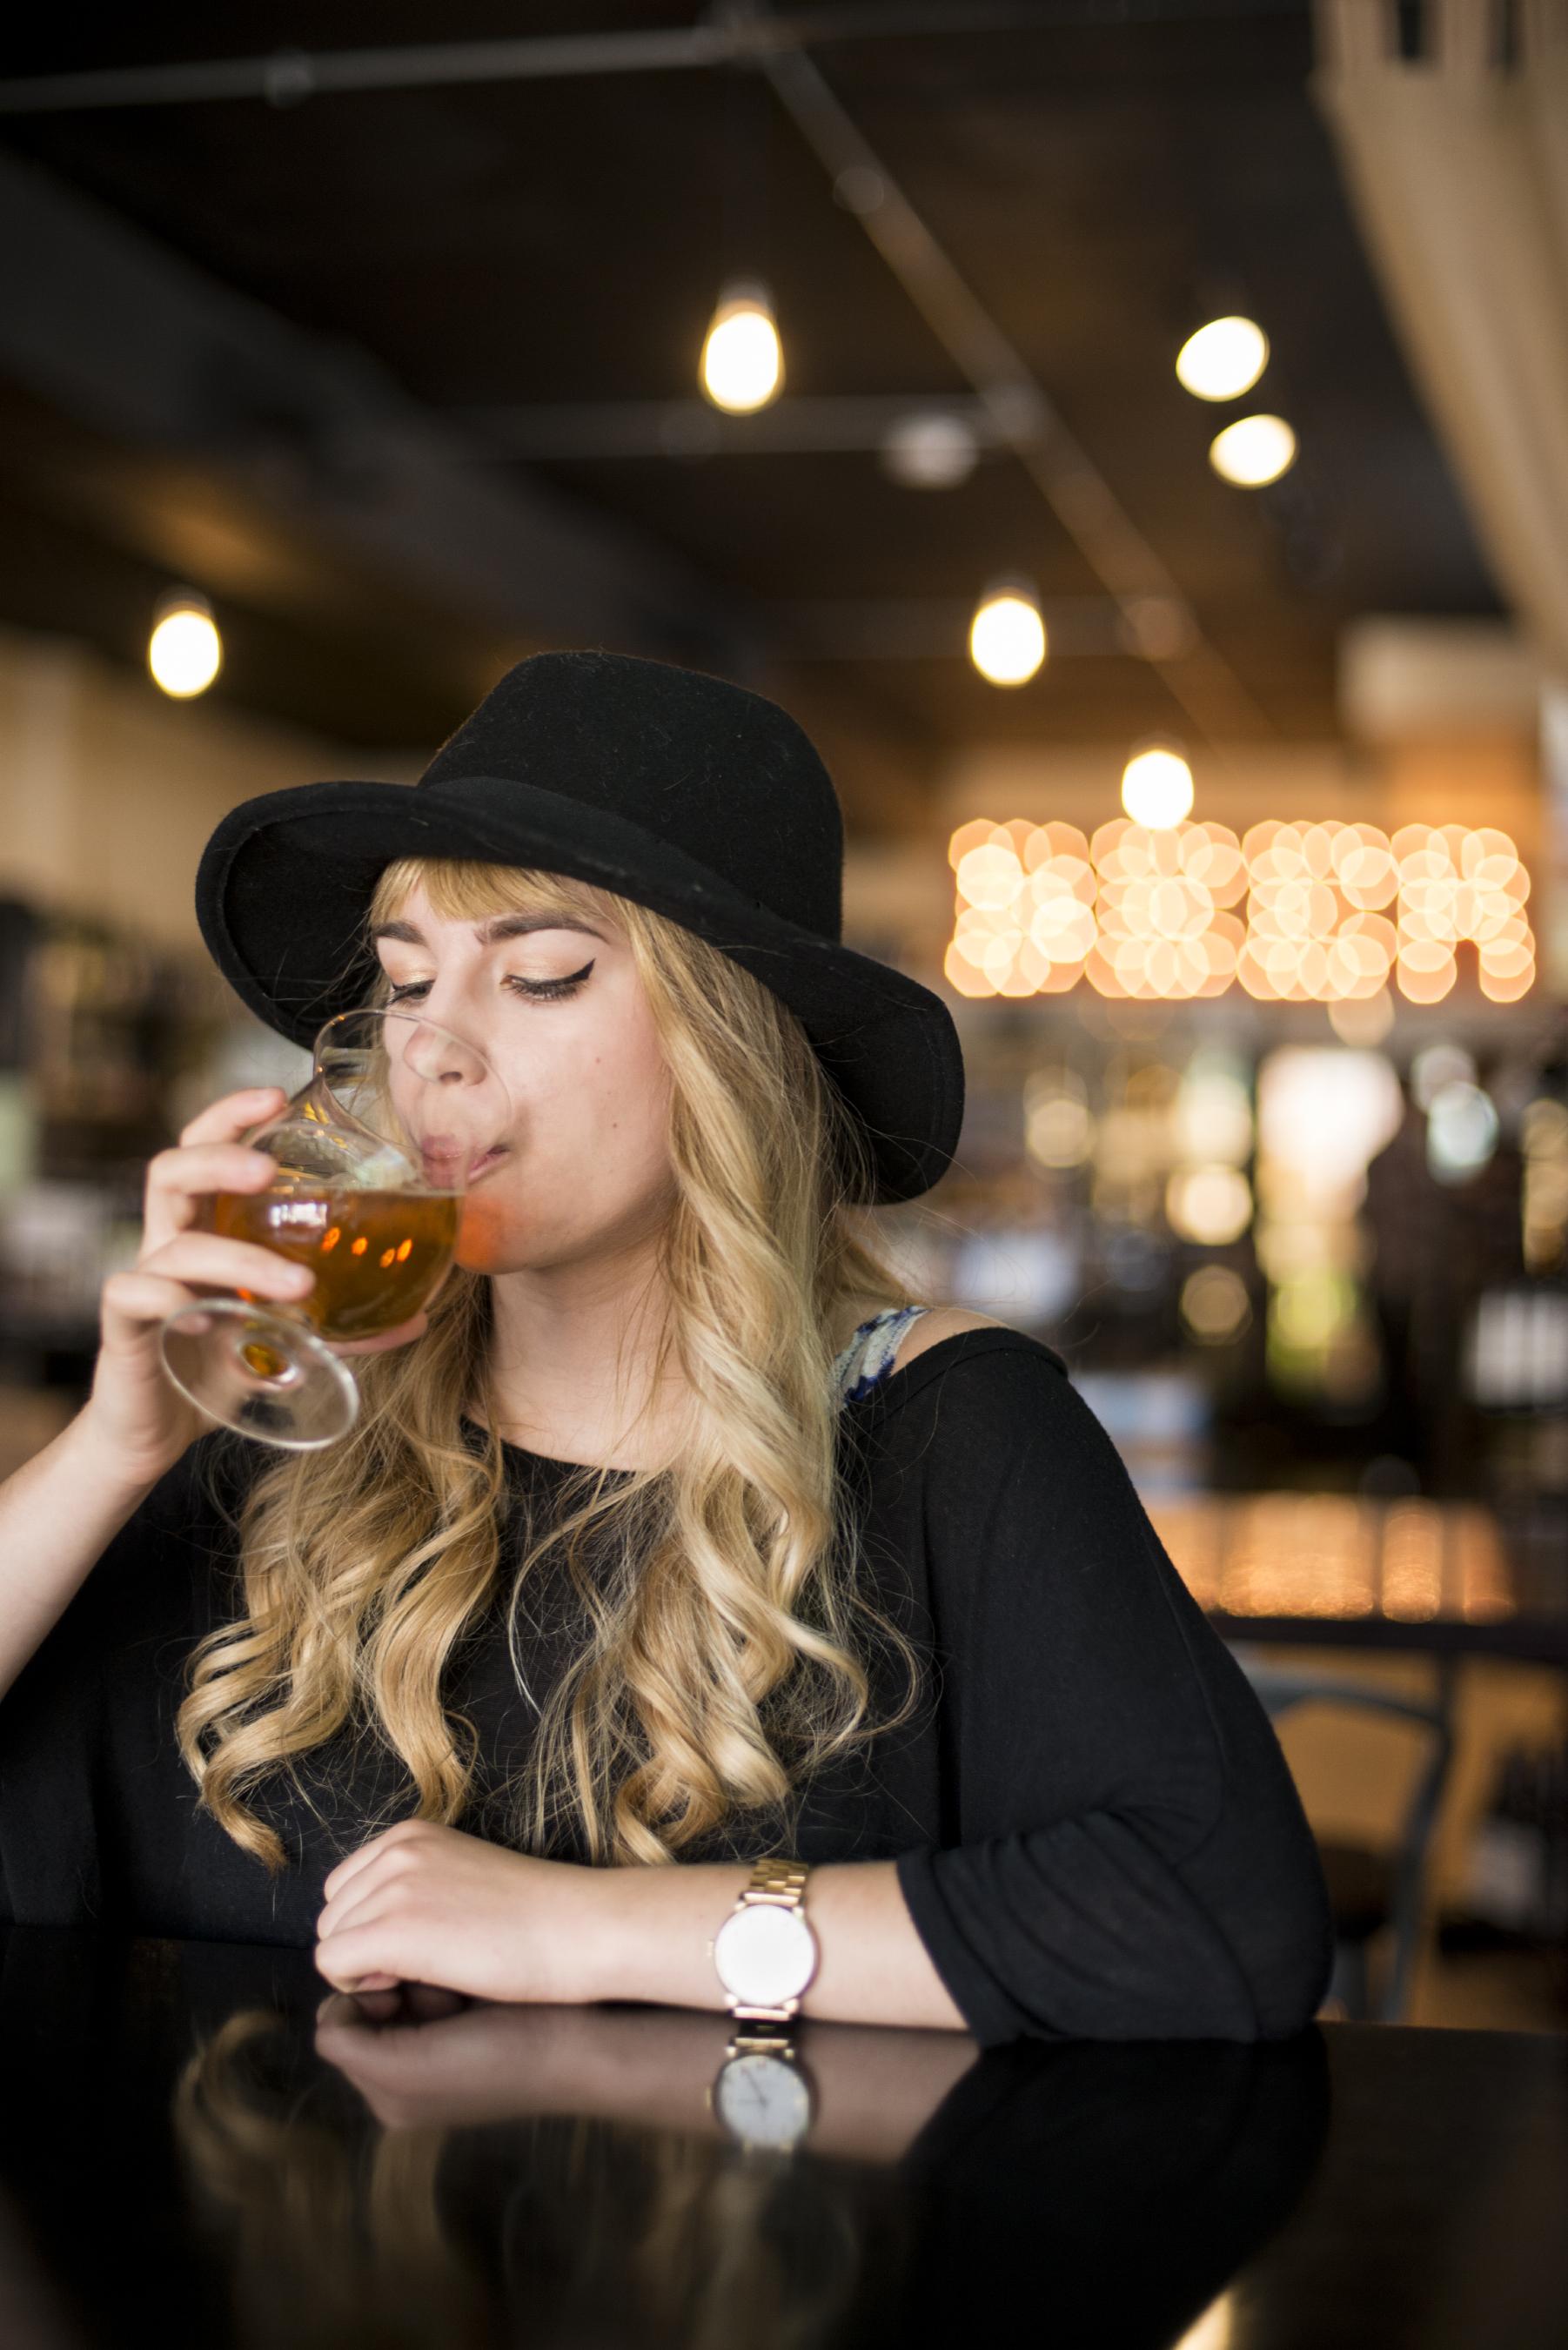 sarahwintlephotography_beer_tasting_lifestyle_original_